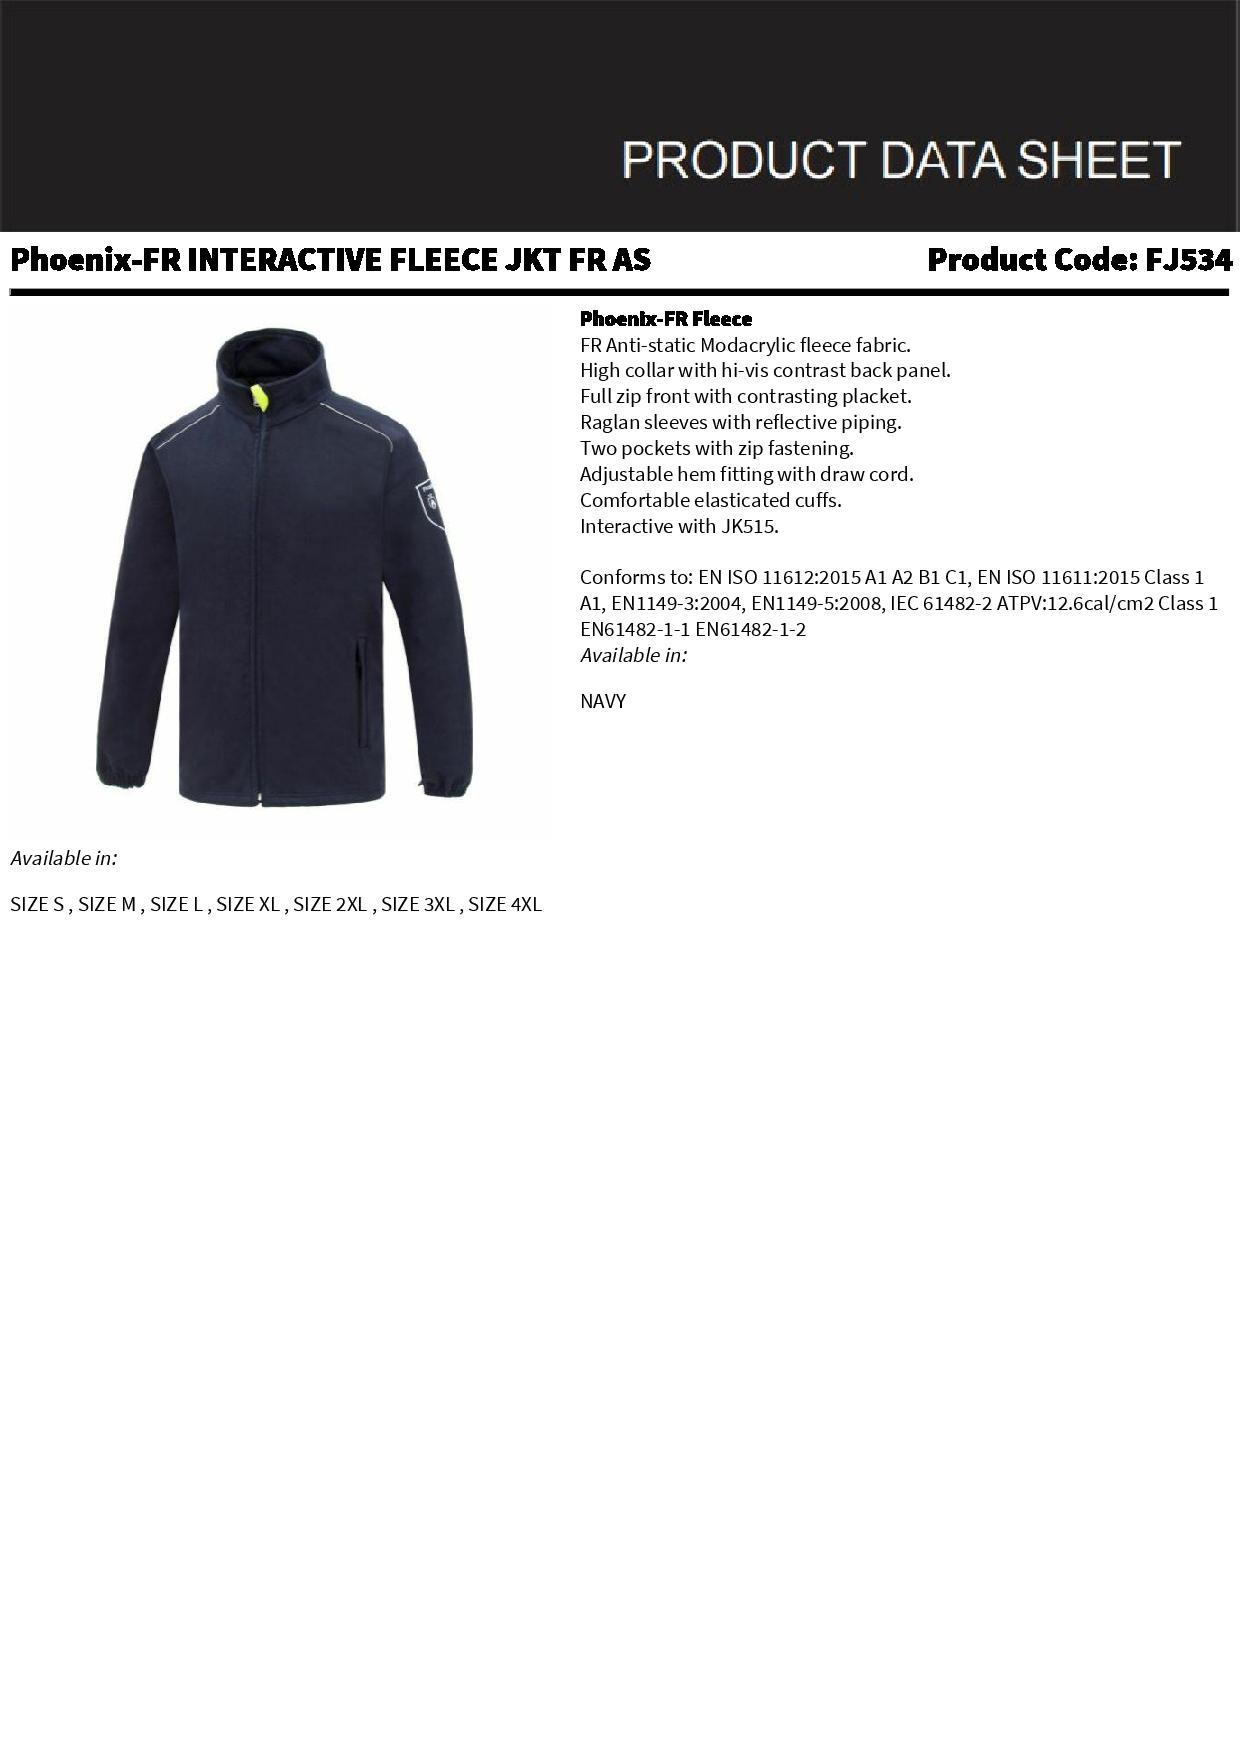 92efa0ec277 Phoenix - Flame Retardant Anti-Static Protection Fleece Jacket ...